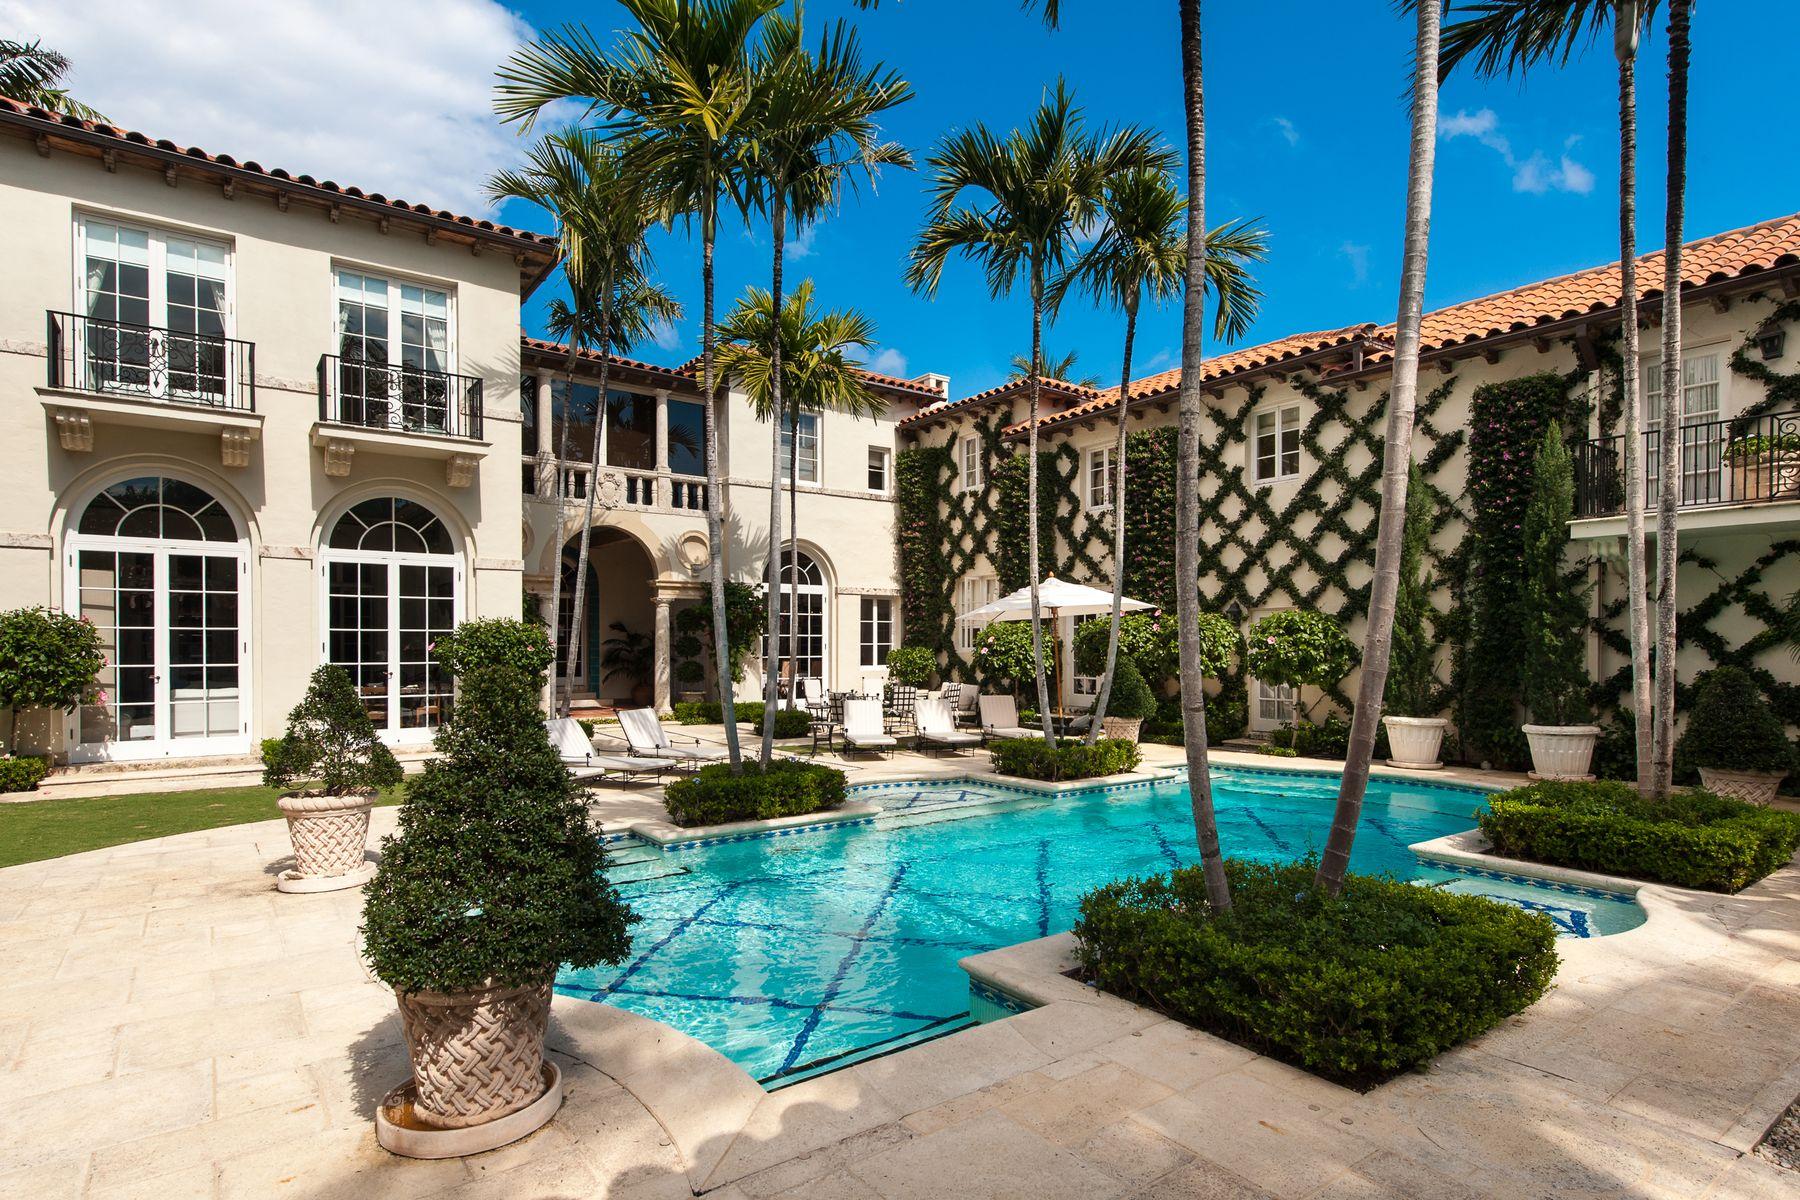 Moradia para Arrendar às 110 Clarke Ave - Annual Lease 110 Clarke Ave Palm Beach, Florida 33480 Estados Unidos